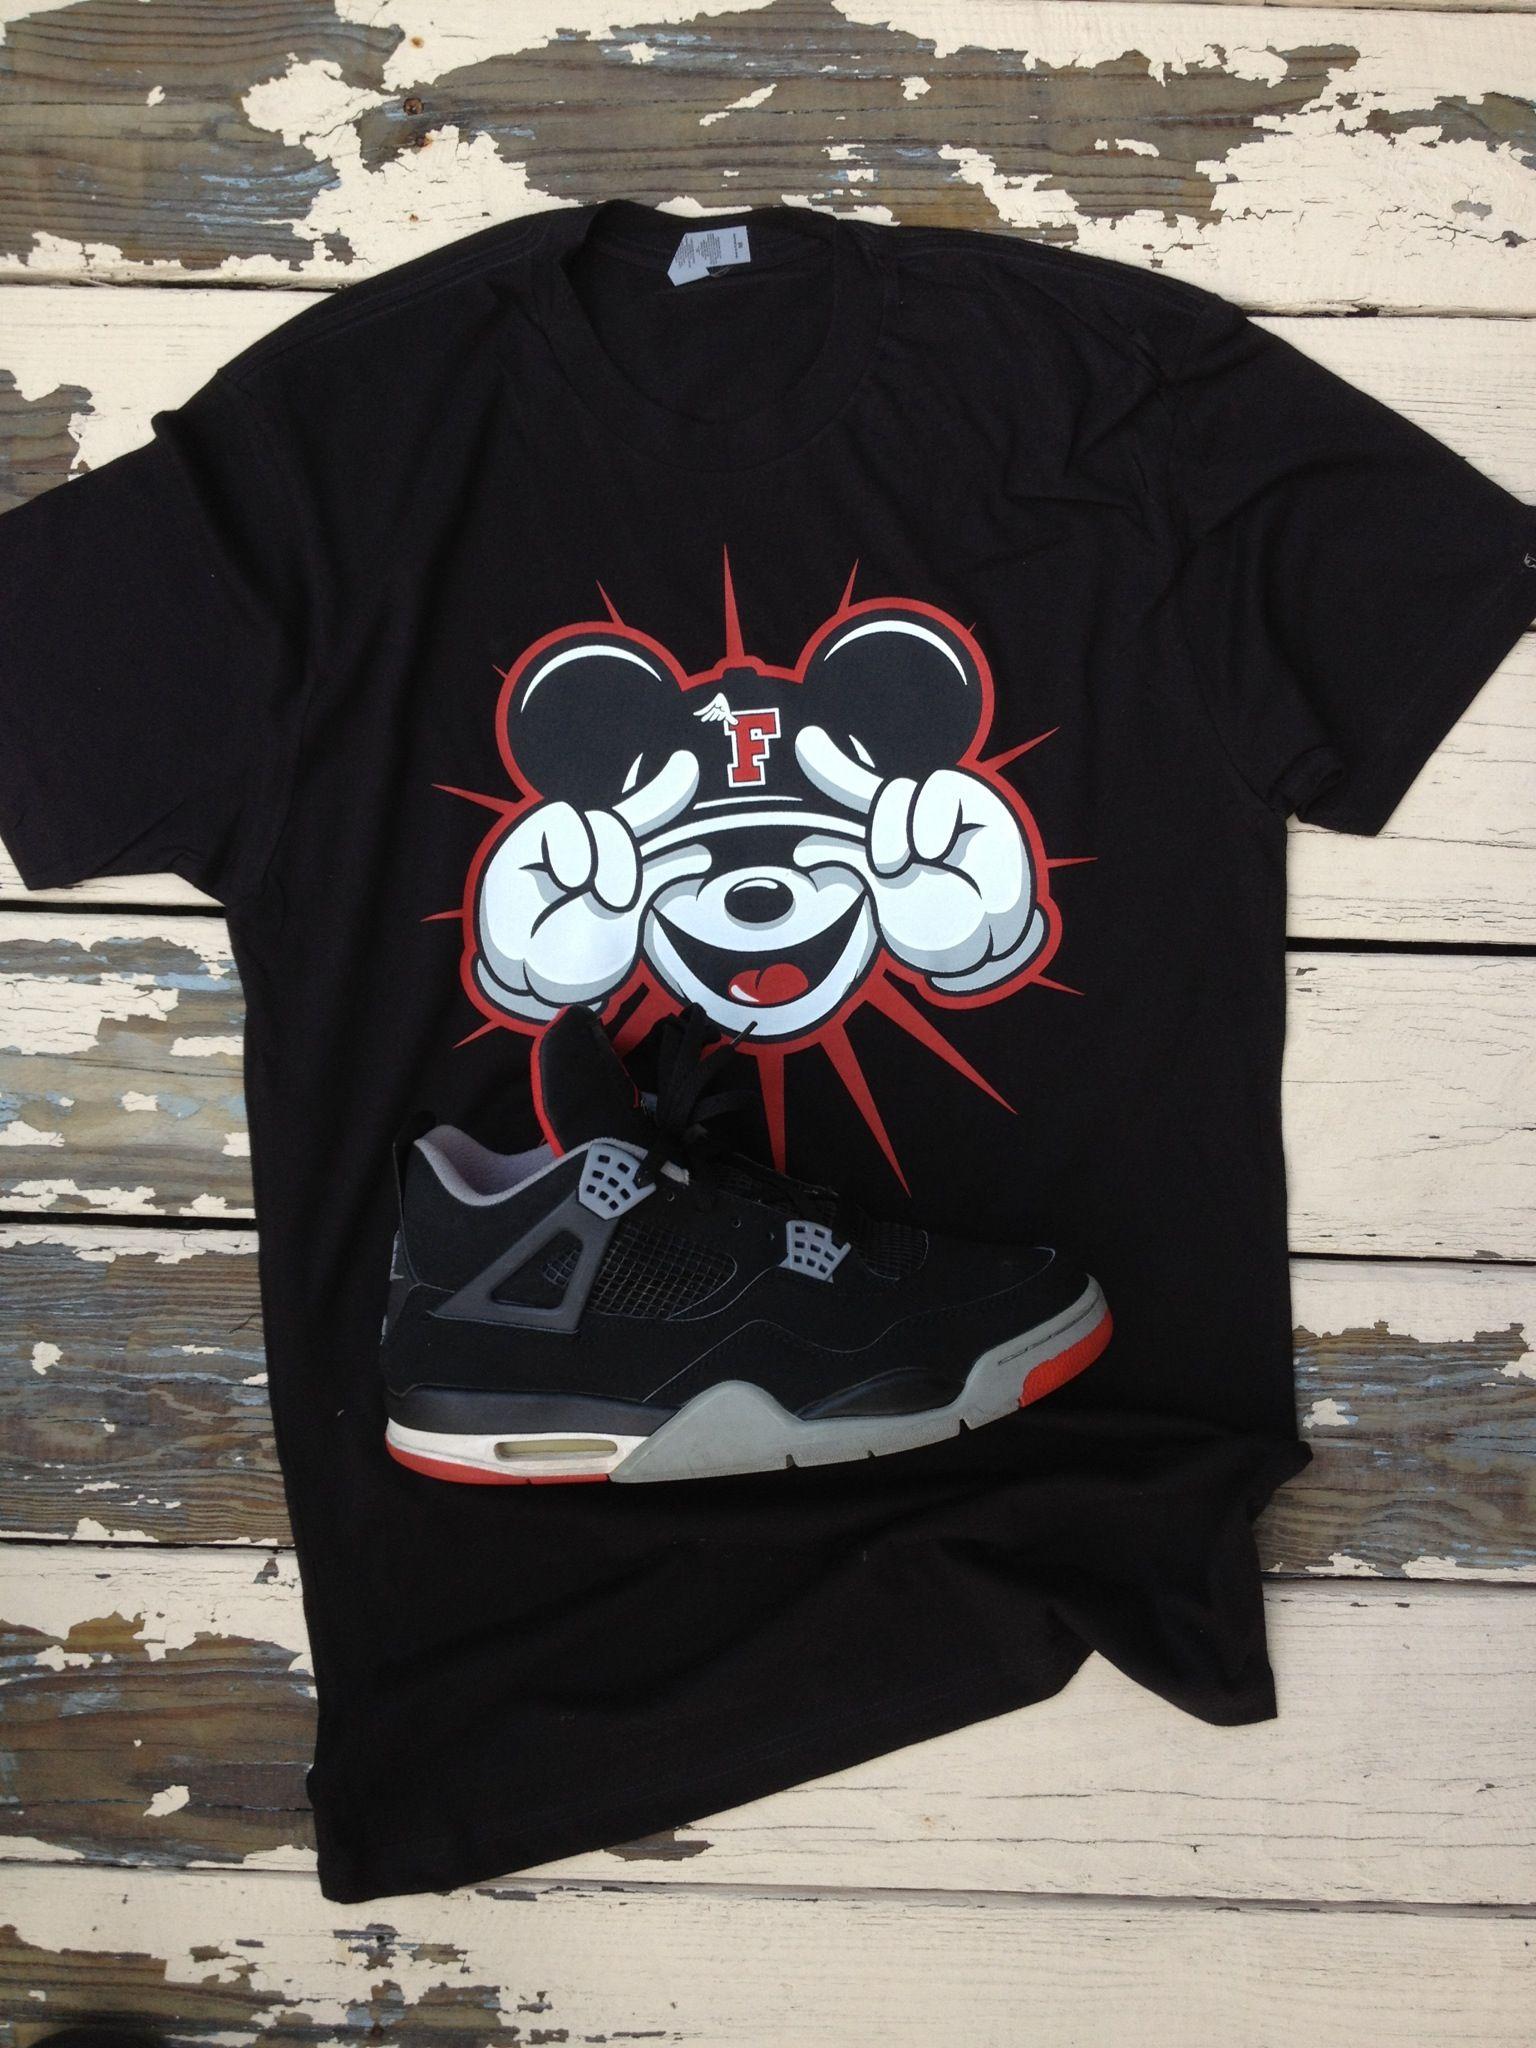 T shirt design jordan - Fly Mickey T Shirt Design To Match The Jordan Retro 4 S By Donpdesign Com